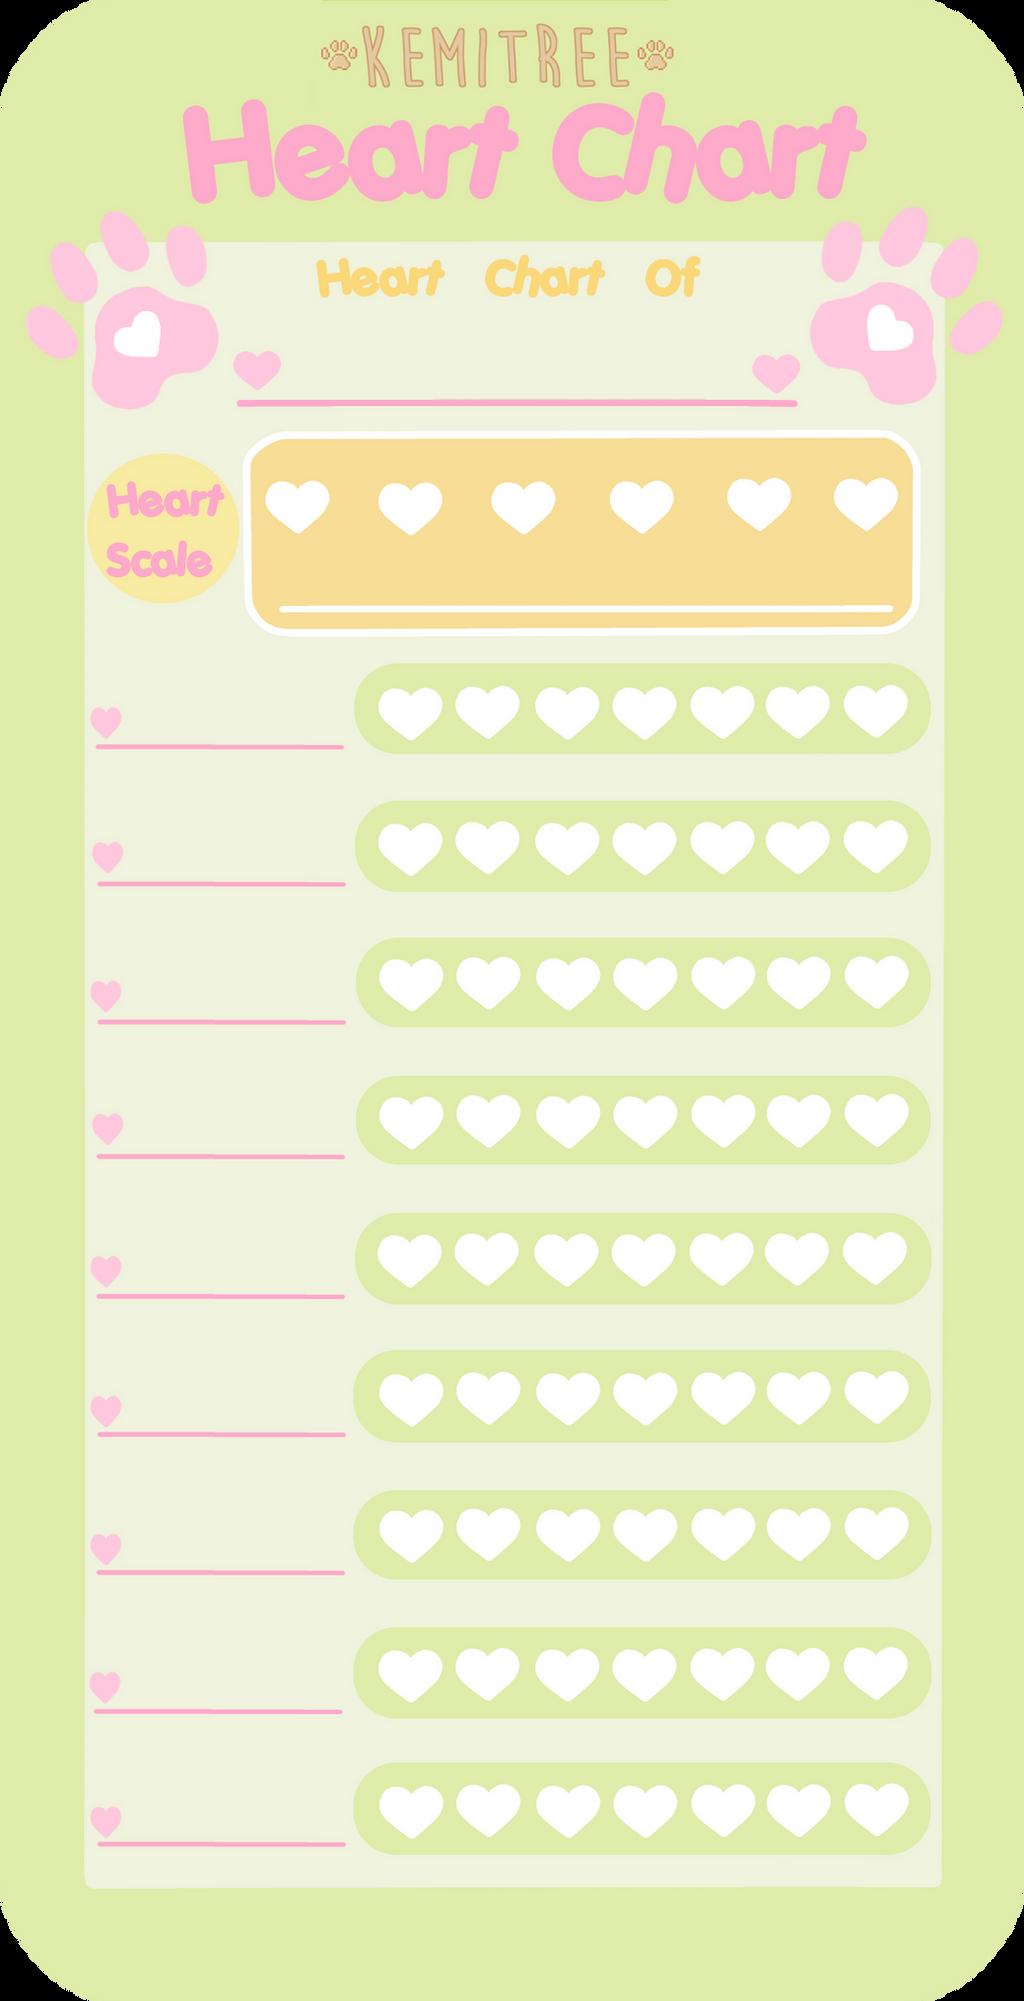 Kemitree Character Heart Chart Template By Shotafish On Deviantart